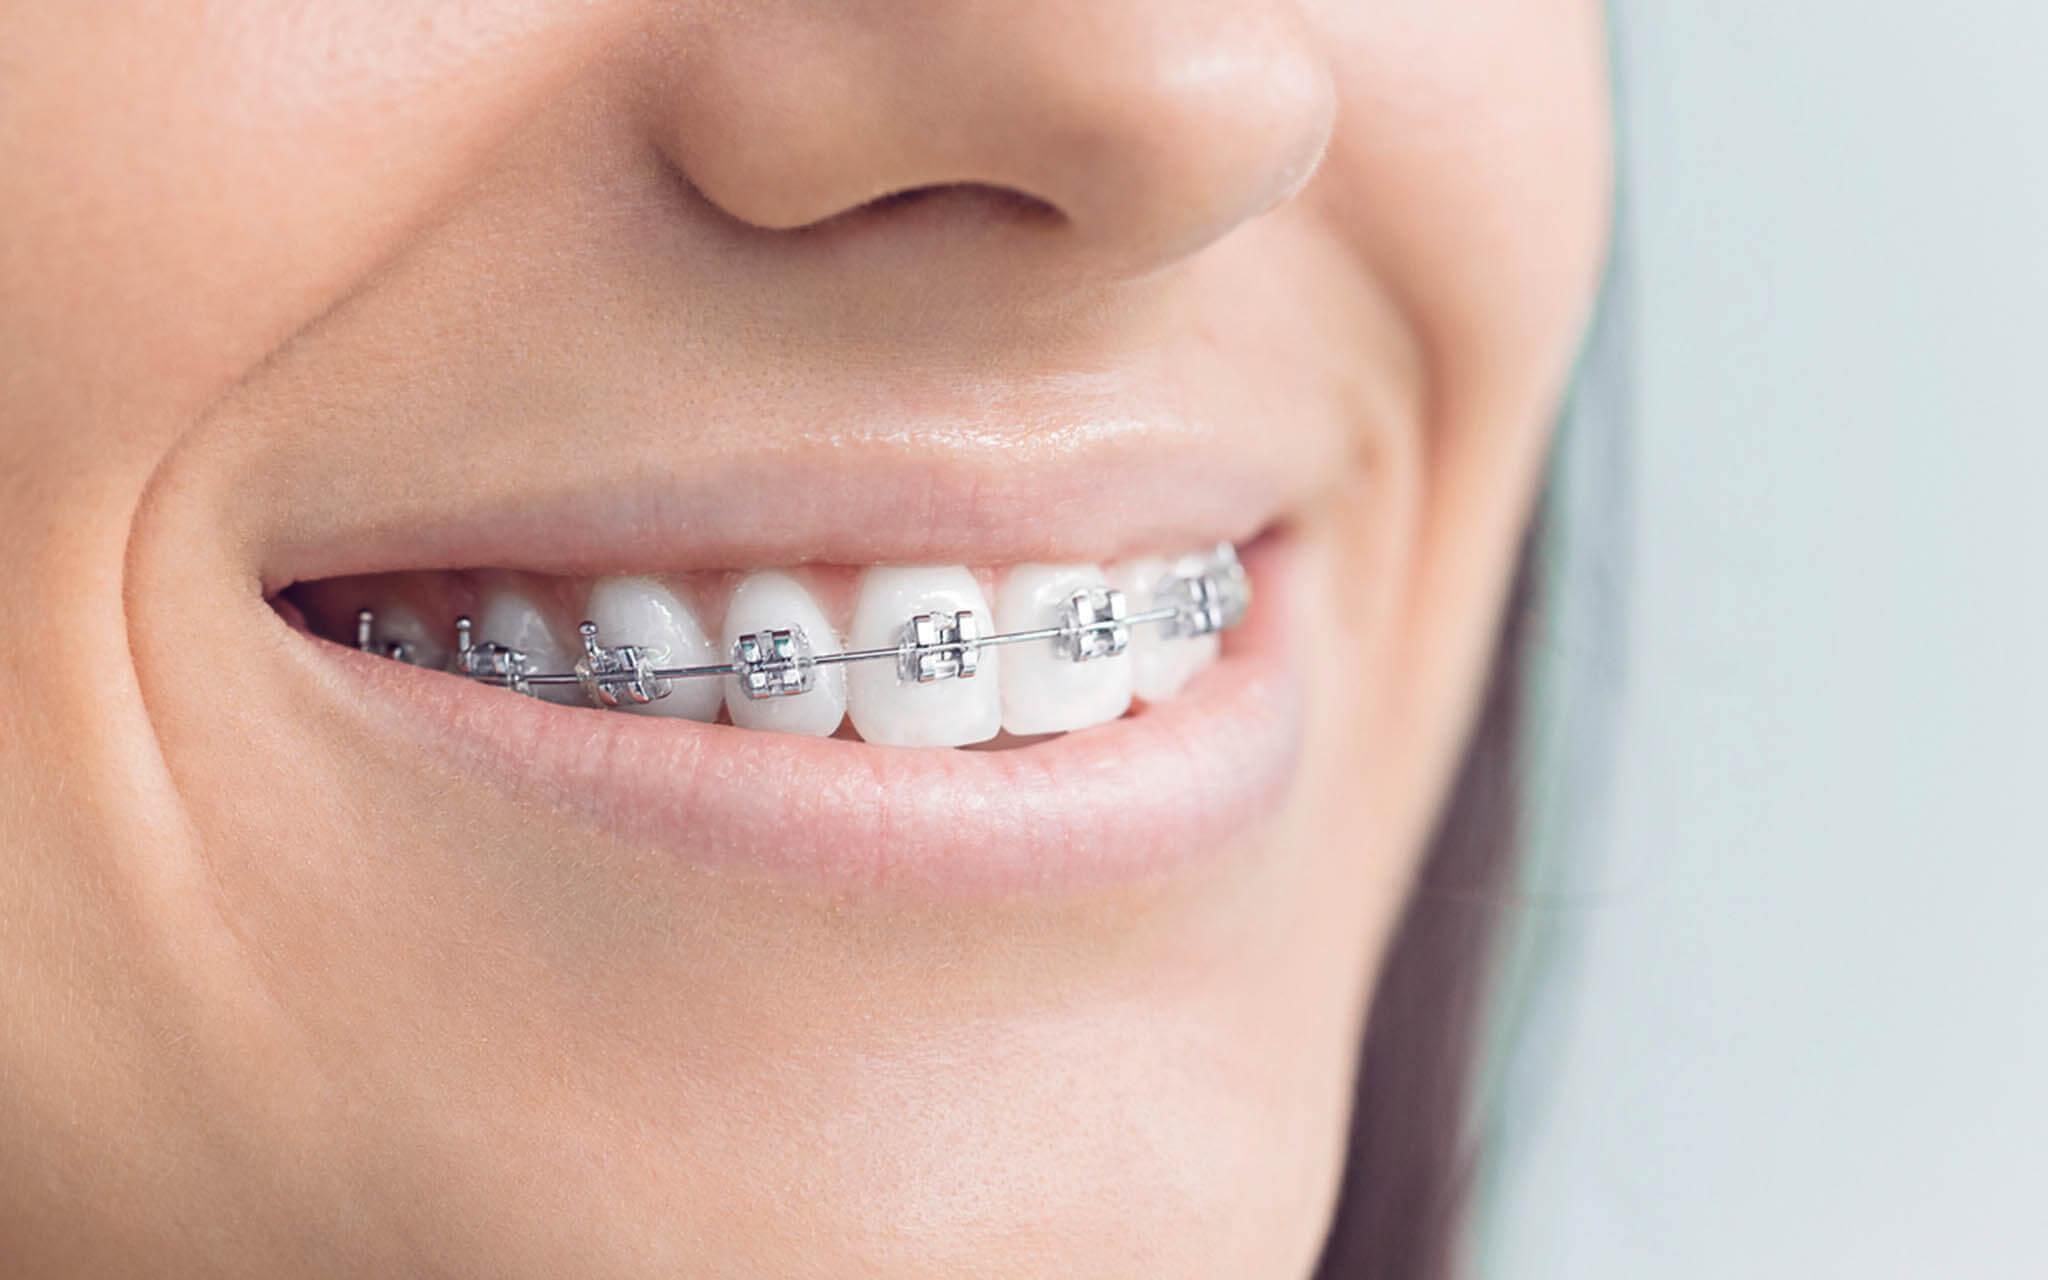 фото металлических брекетов на зубах содержания